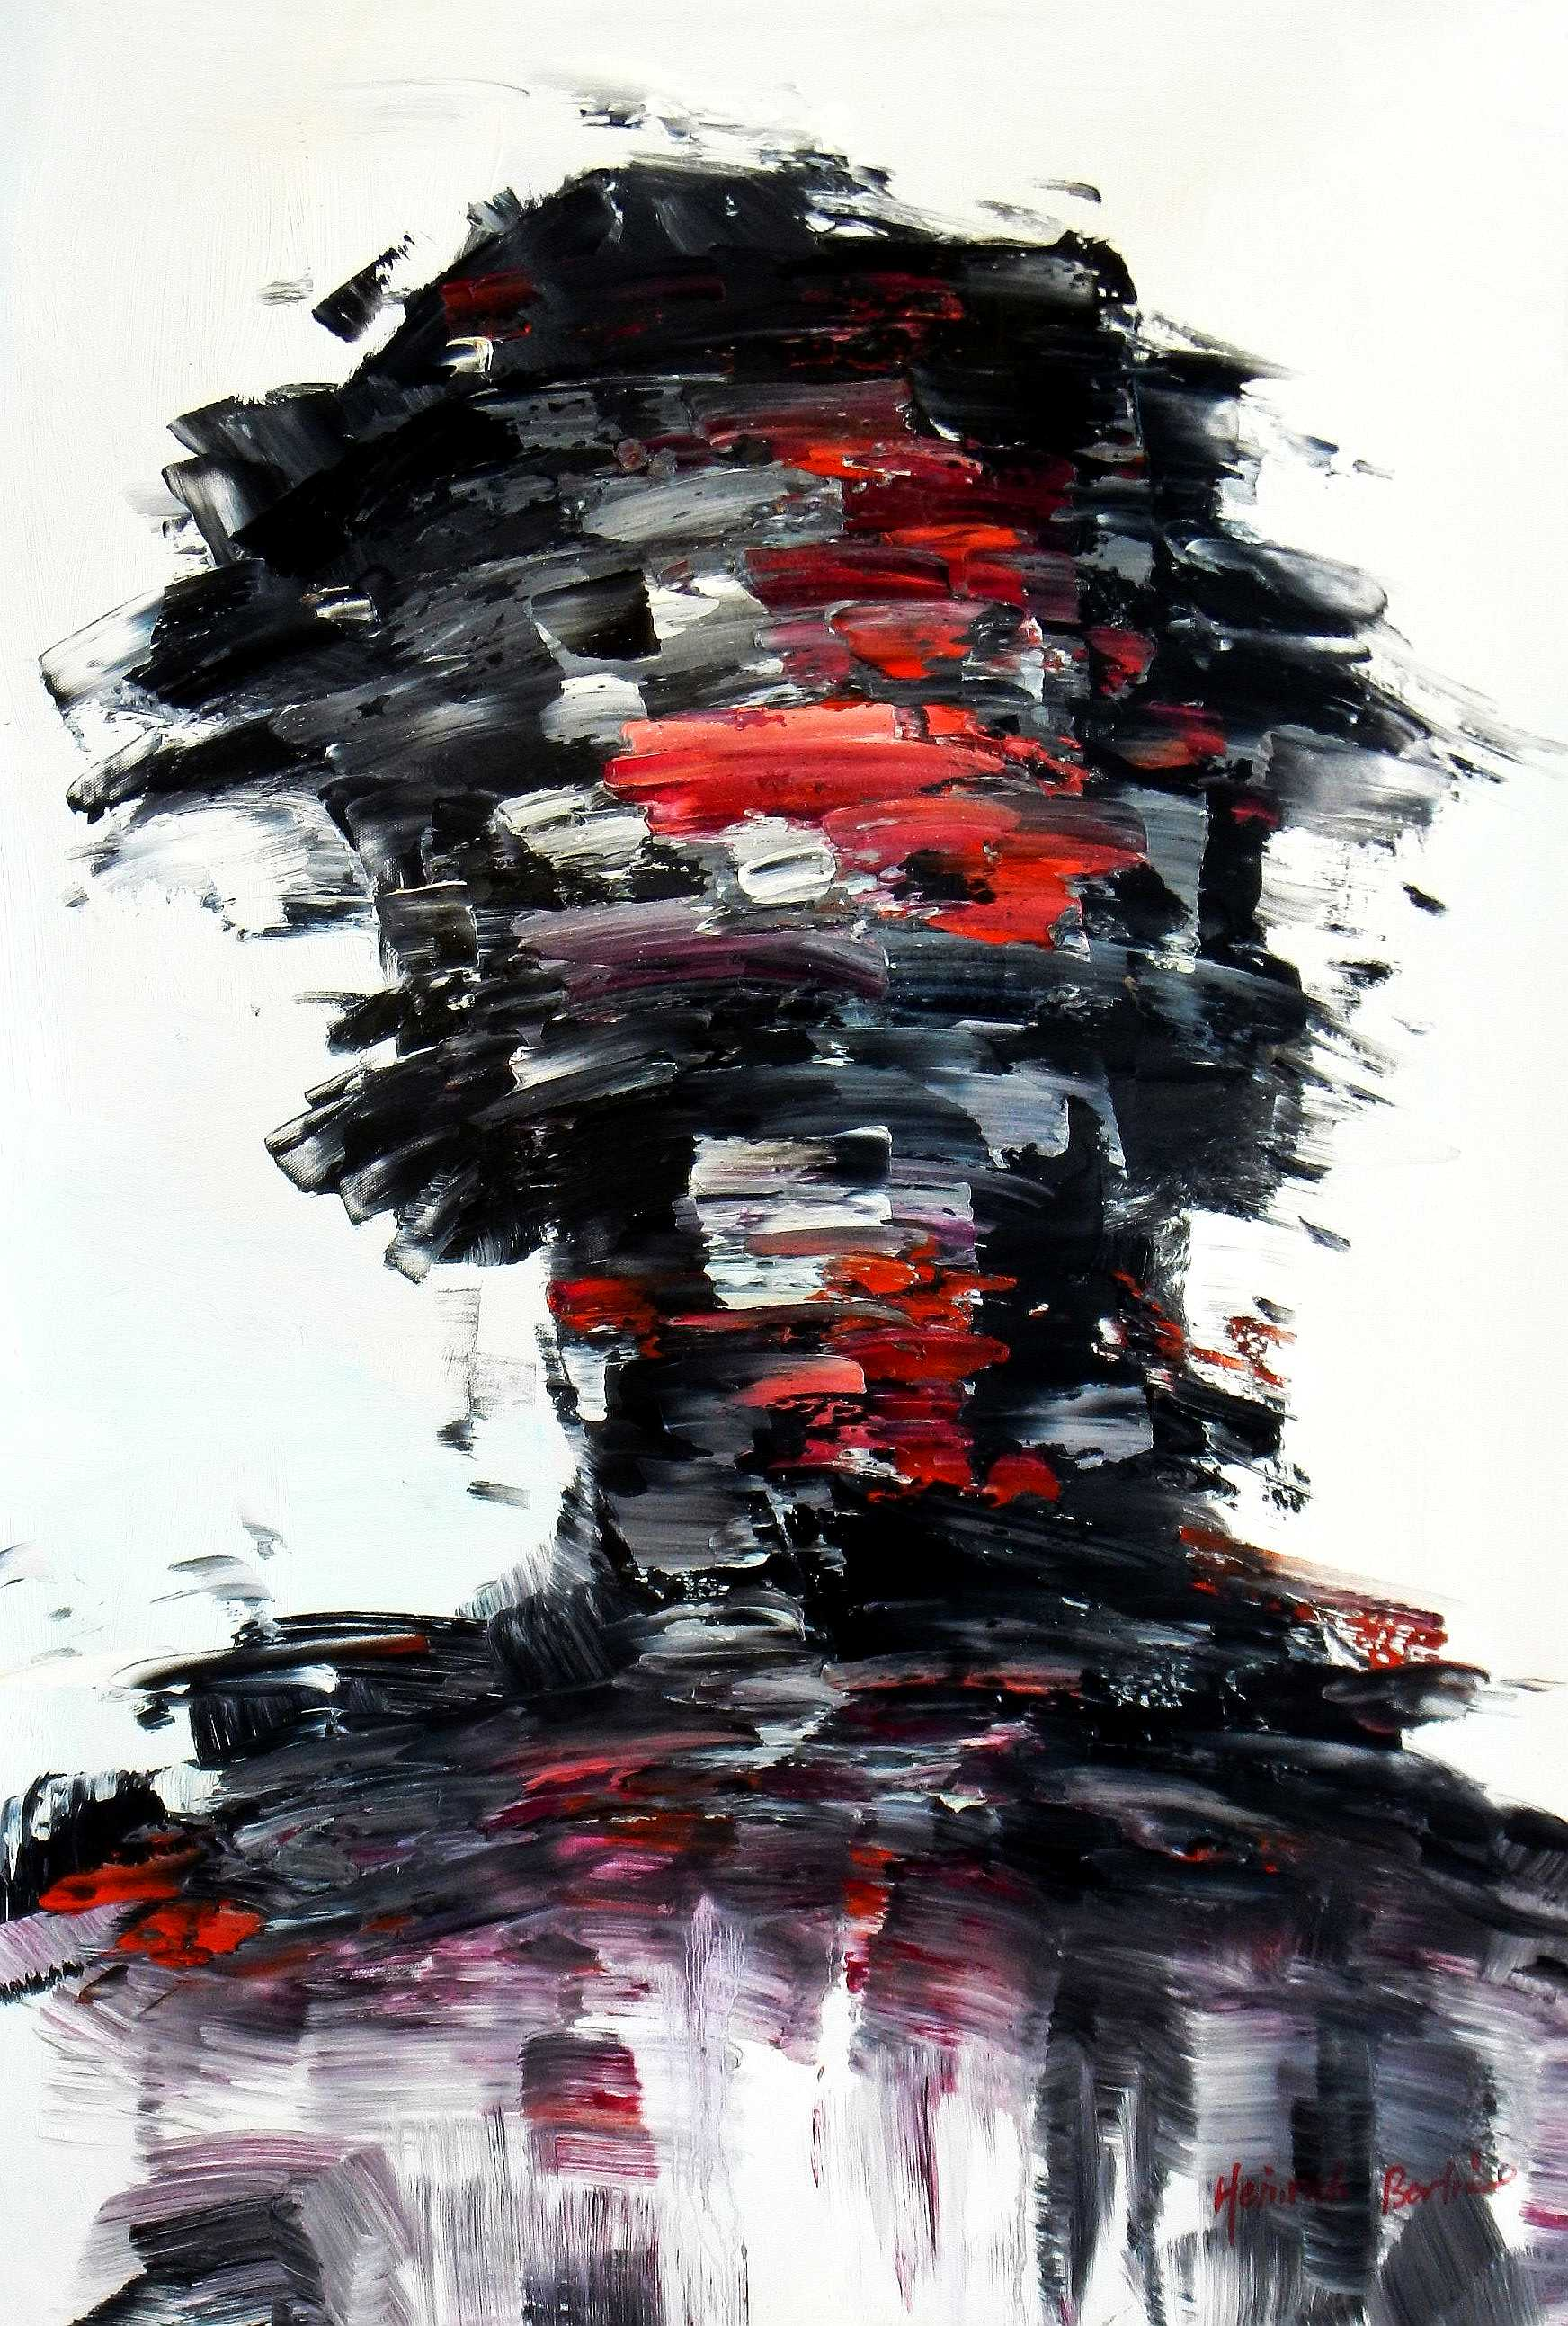 Abstract - Person of interest d95195 60x90cm abstraktes Ölbild